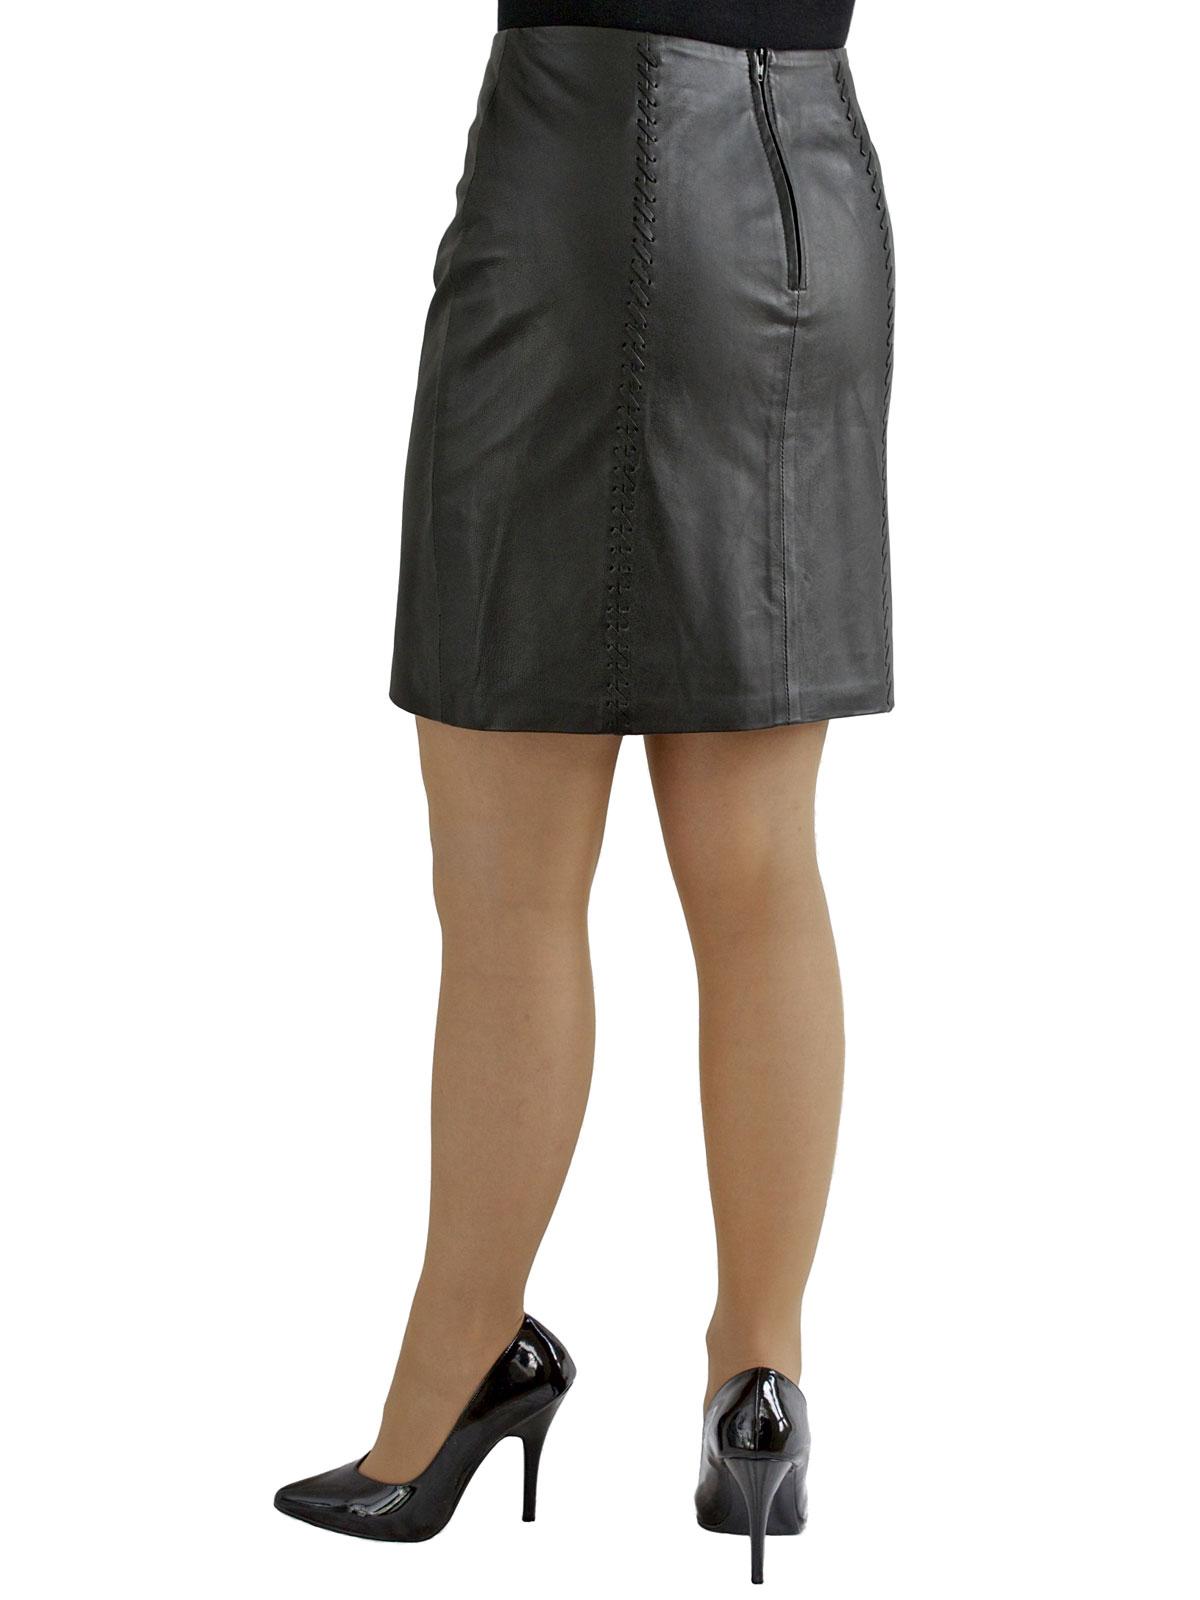 Black Soft Leather Mini Skirt laced seams - Tout Ensemble